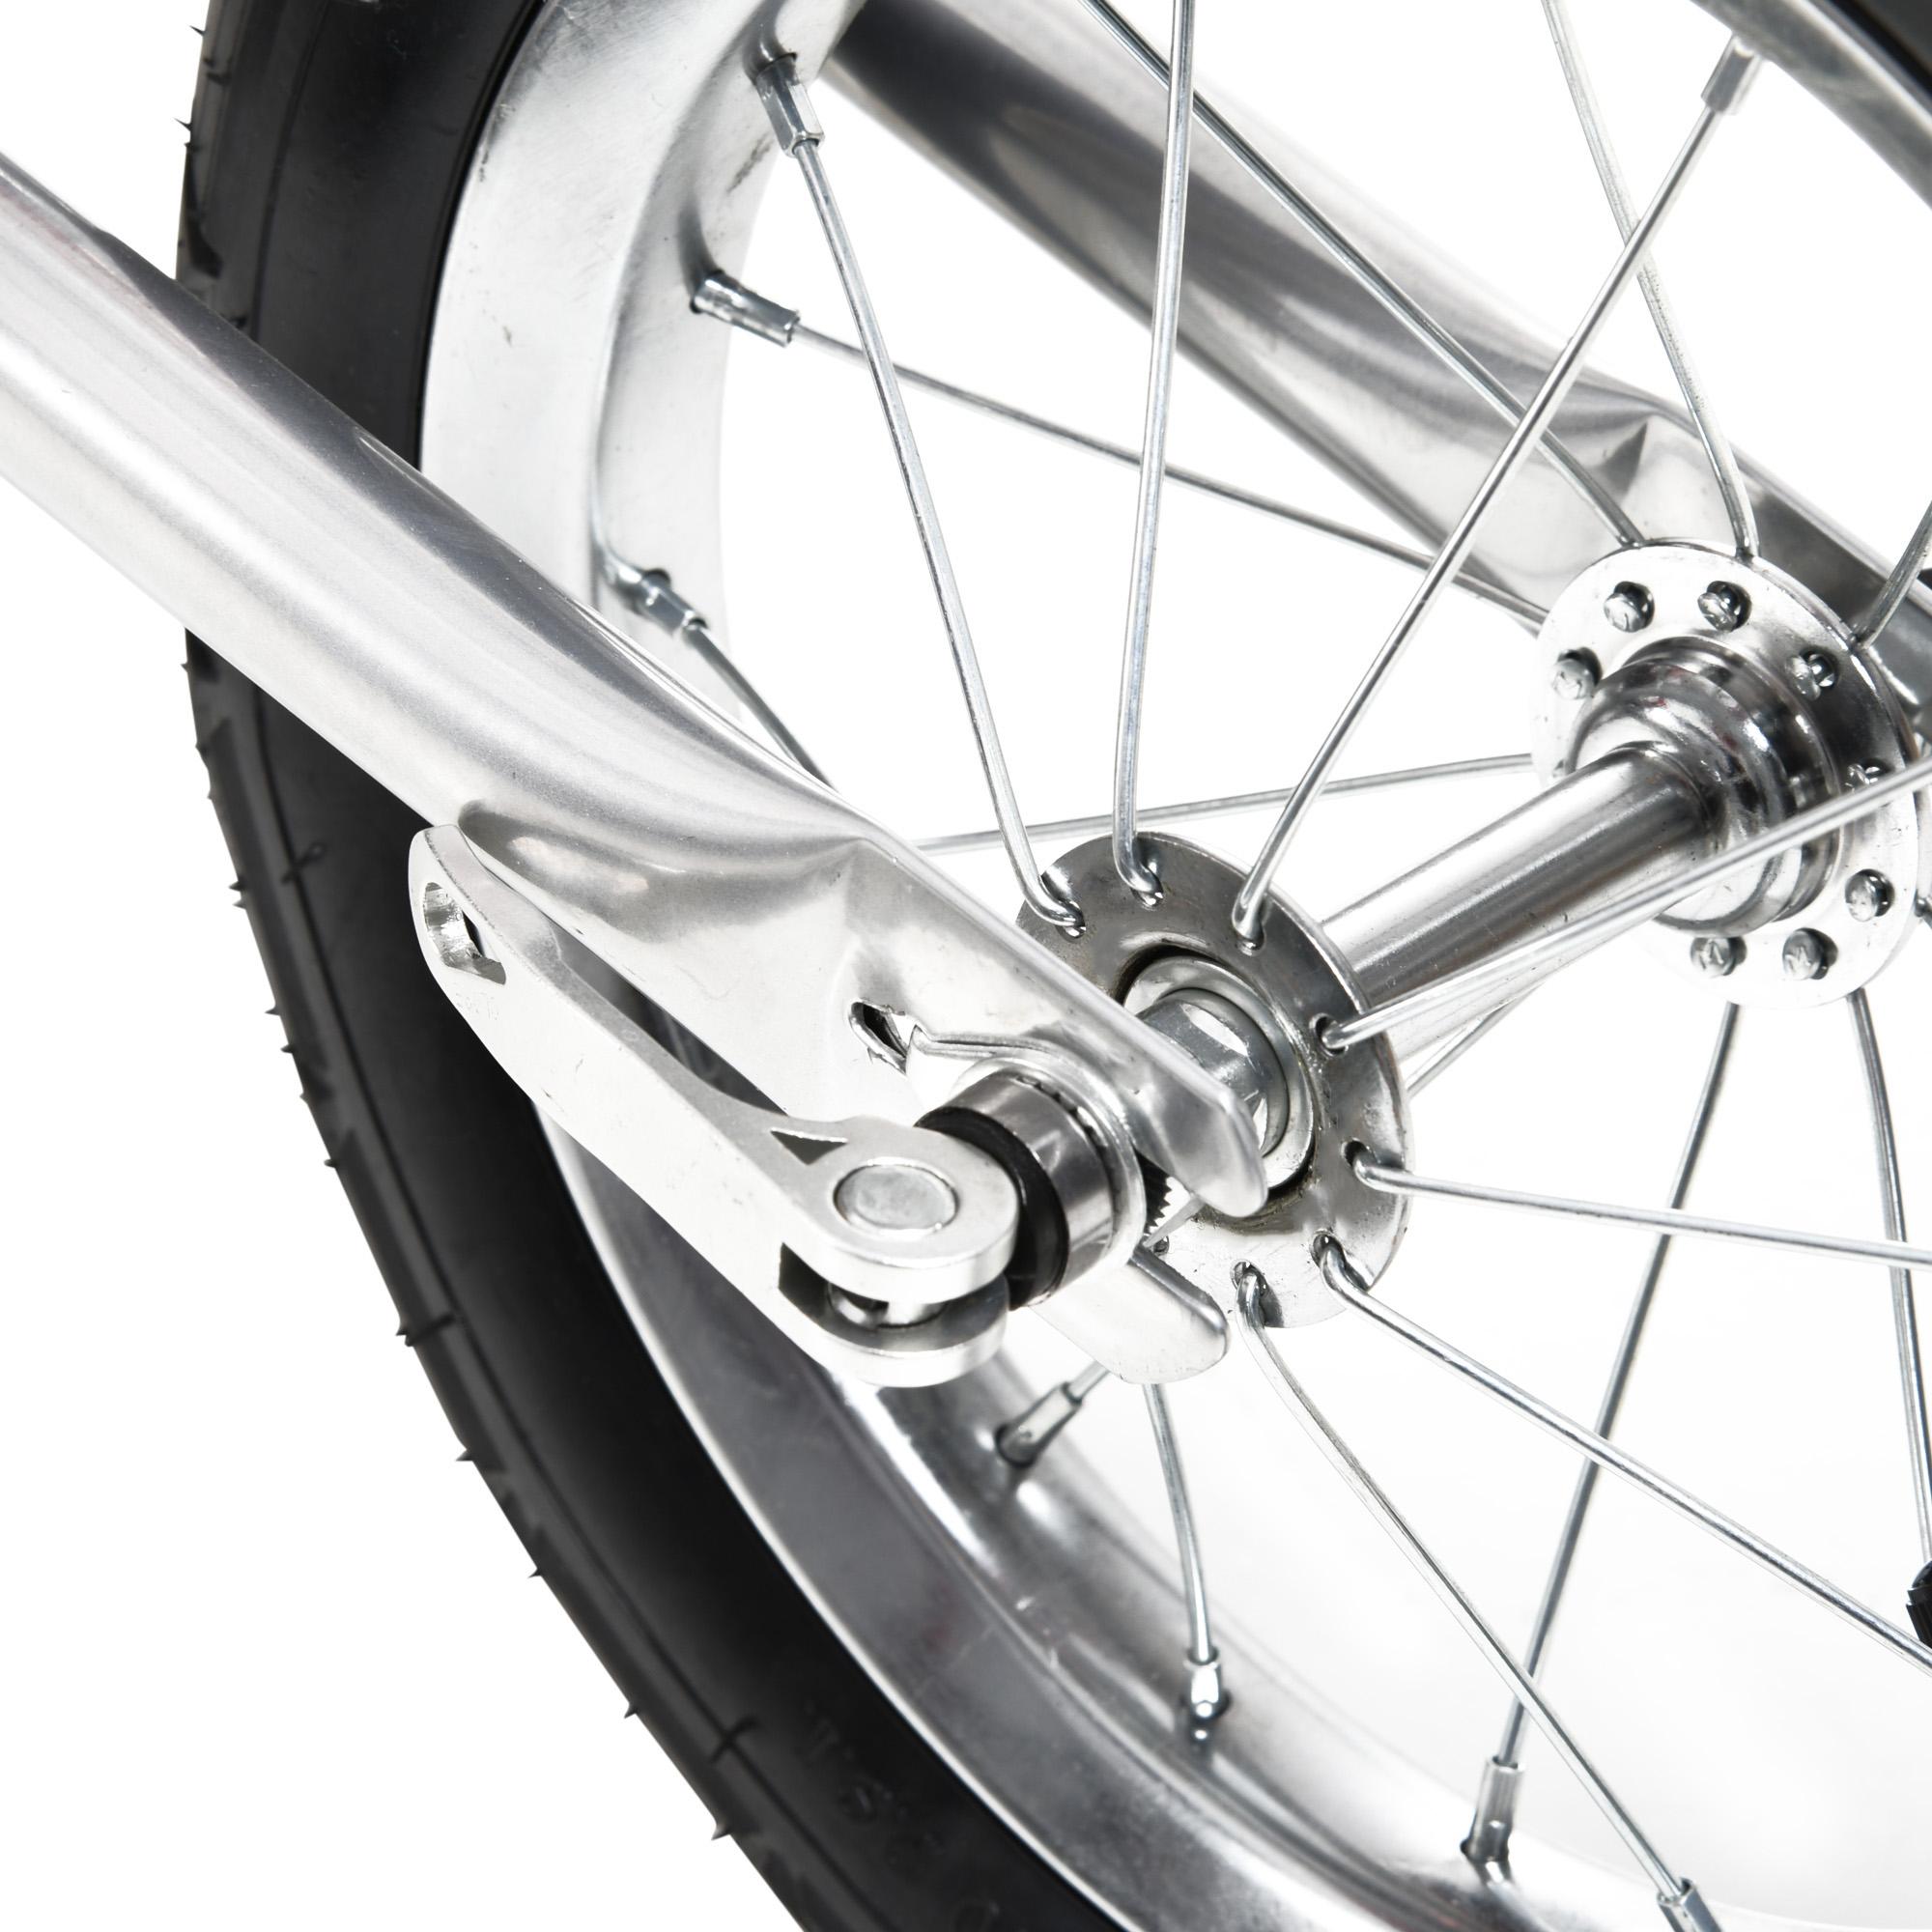 miniatura 47 - Remolque Bicicleta Niño 2 PLAZAS+Amortiguador Kit Footing Freno Bandera Cubierta